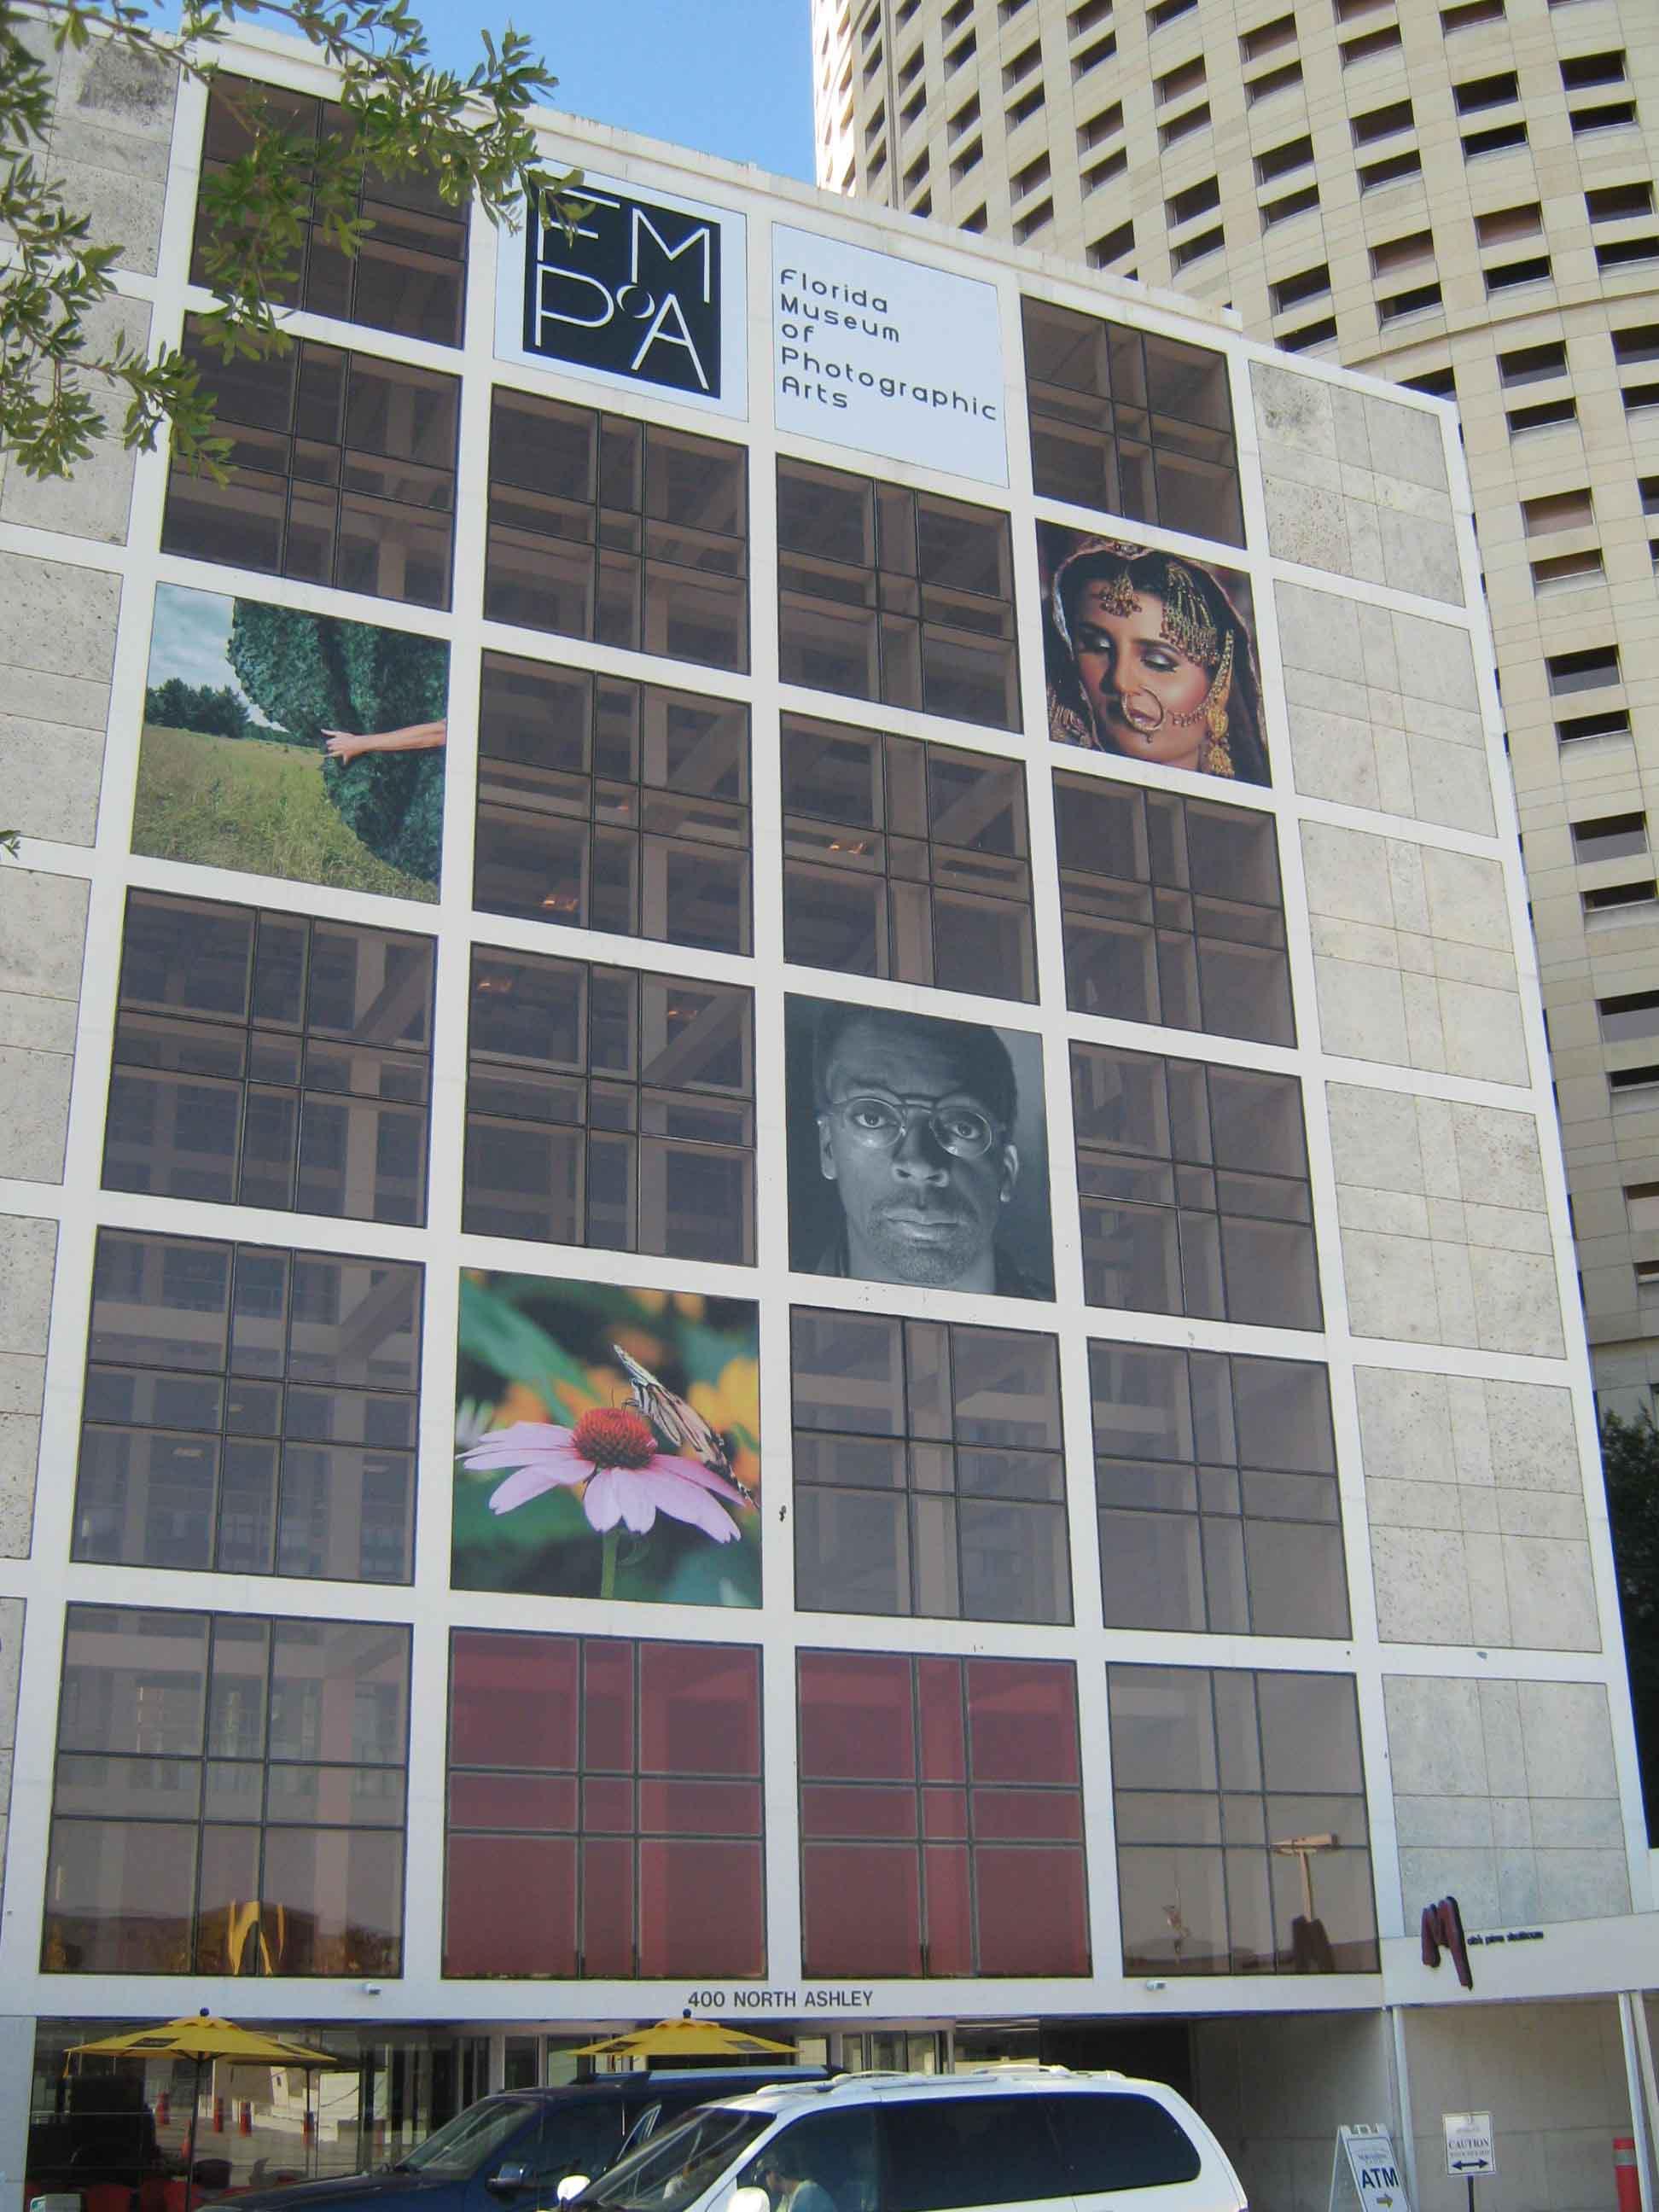 Florida Museum of Photographic Arts, Tampa, FL